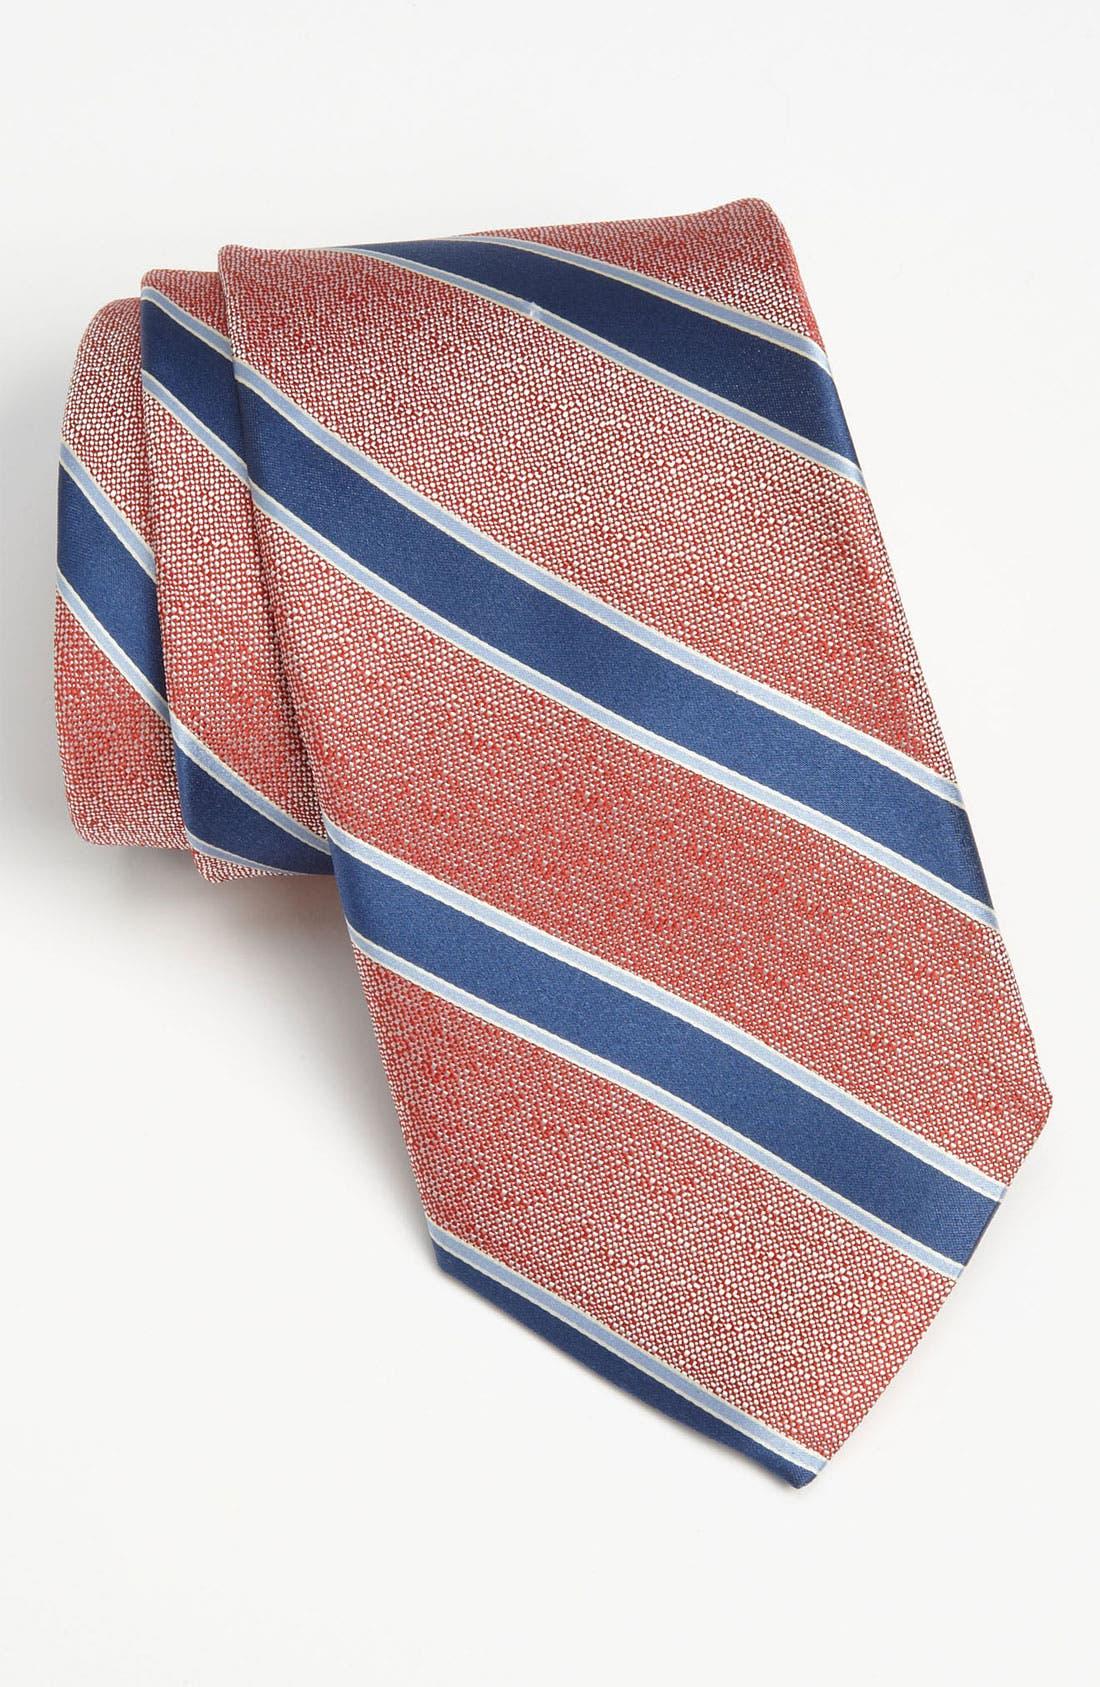 Main Image - John W. Nordstrom Woven Silk Tie